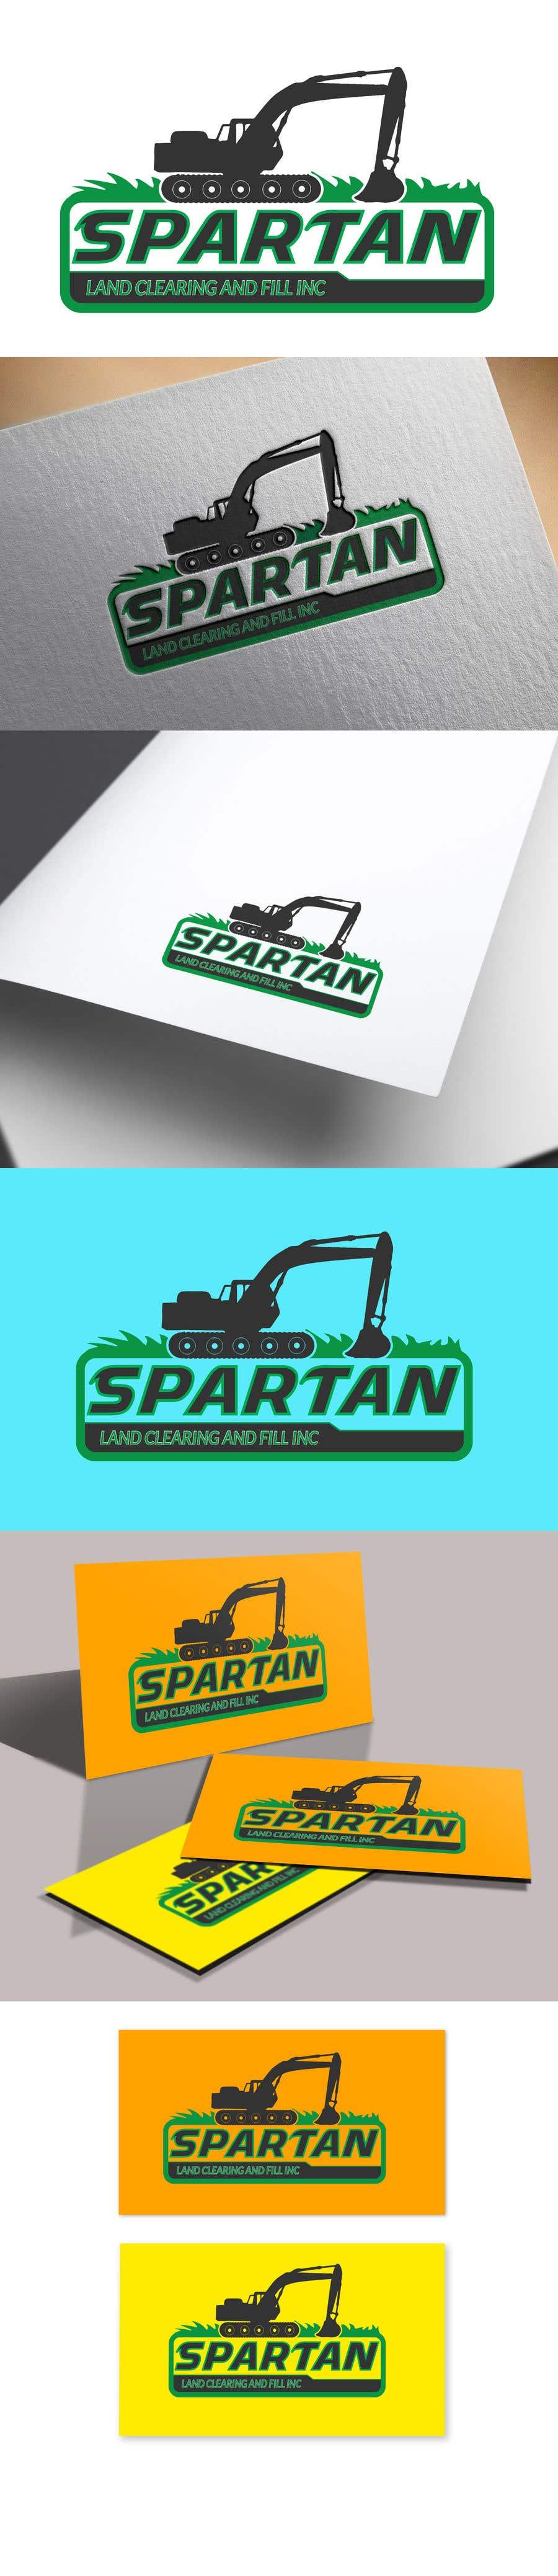 Kilpailutyö #56 kilpailussa design logo for company